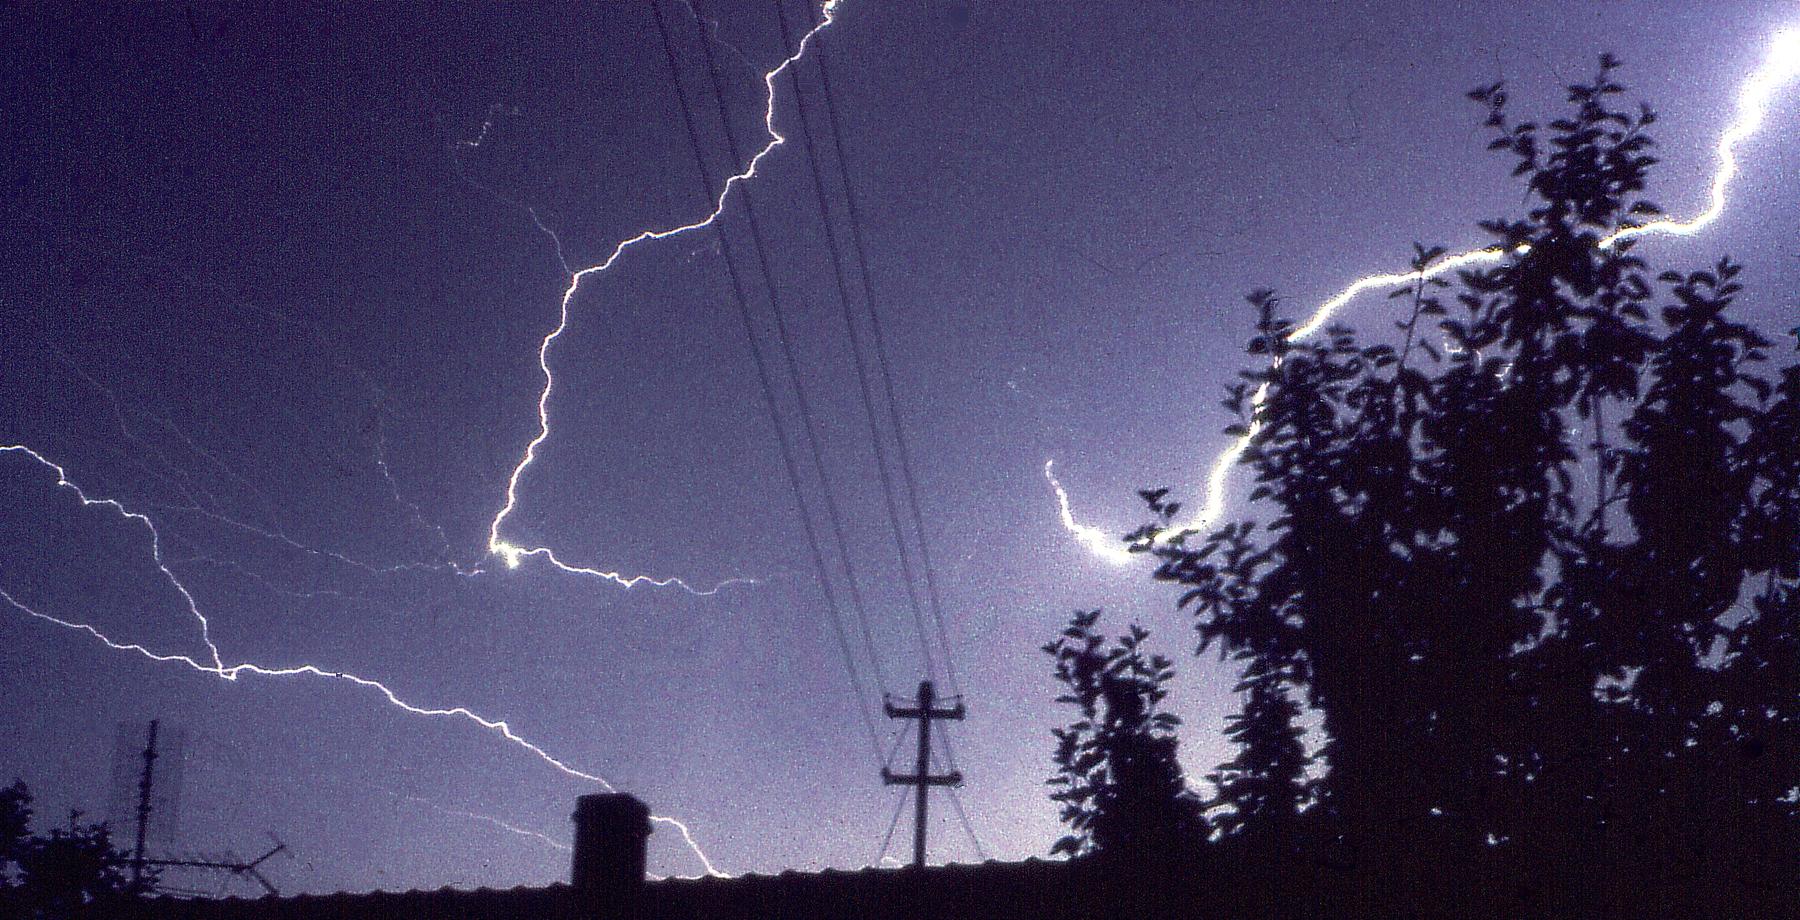 Blitz übersetzung